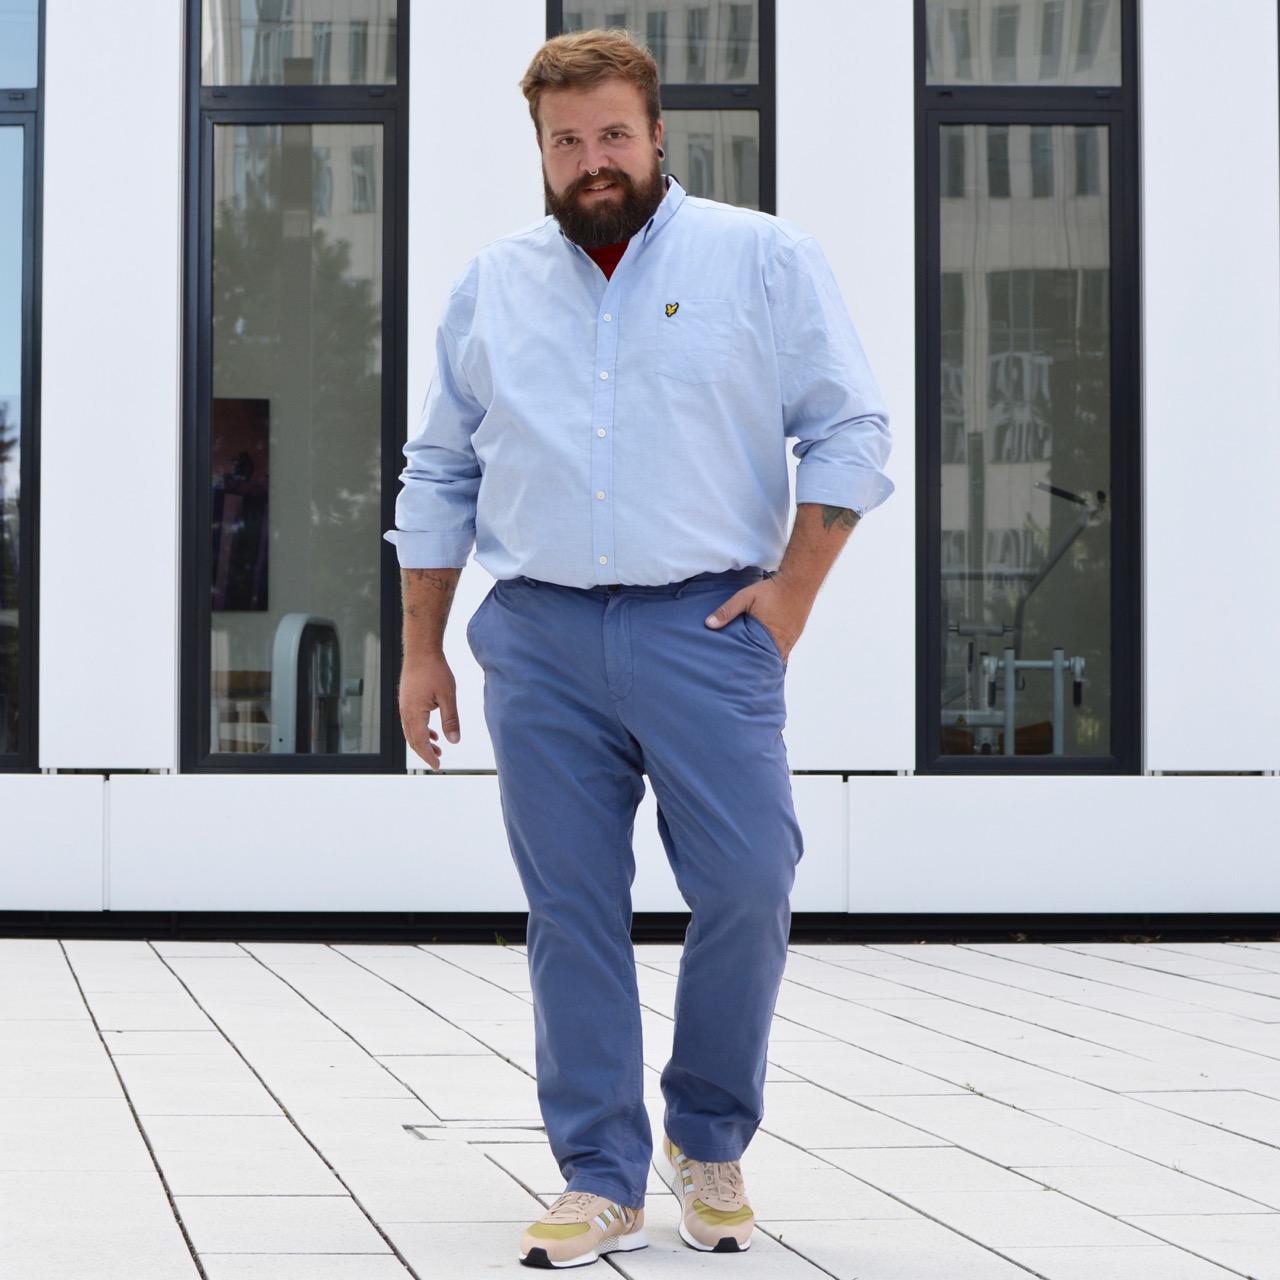 Plus Size Outfits bei Outfittery , Dein Stil. Dein Weg.